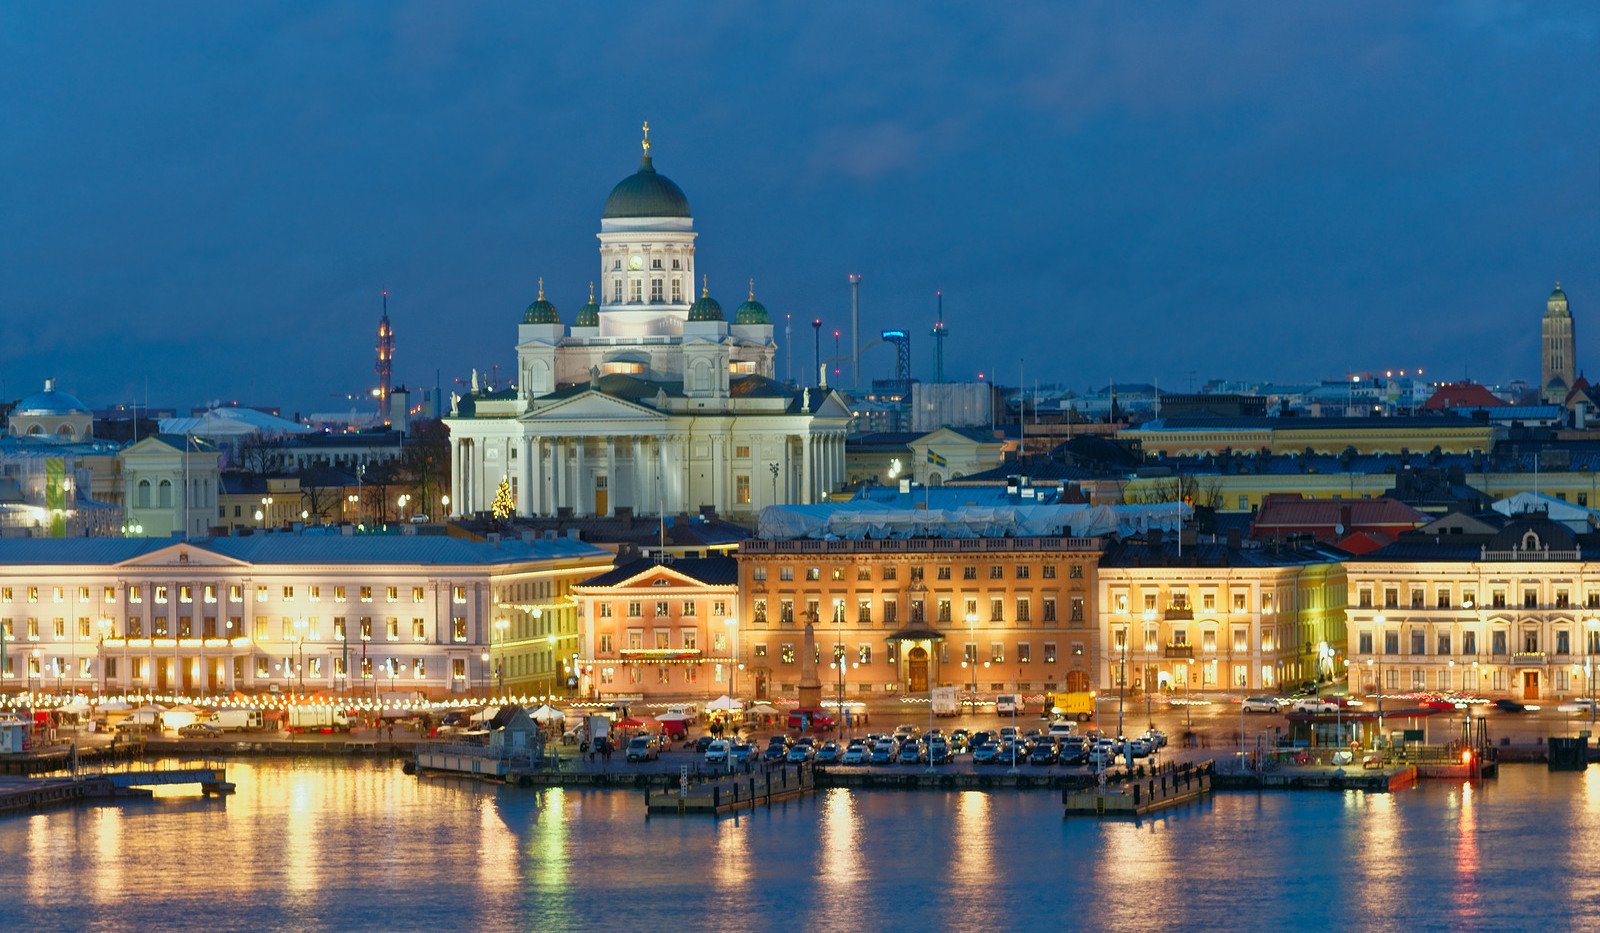 Canva - Night view of Helsinki, Finland.